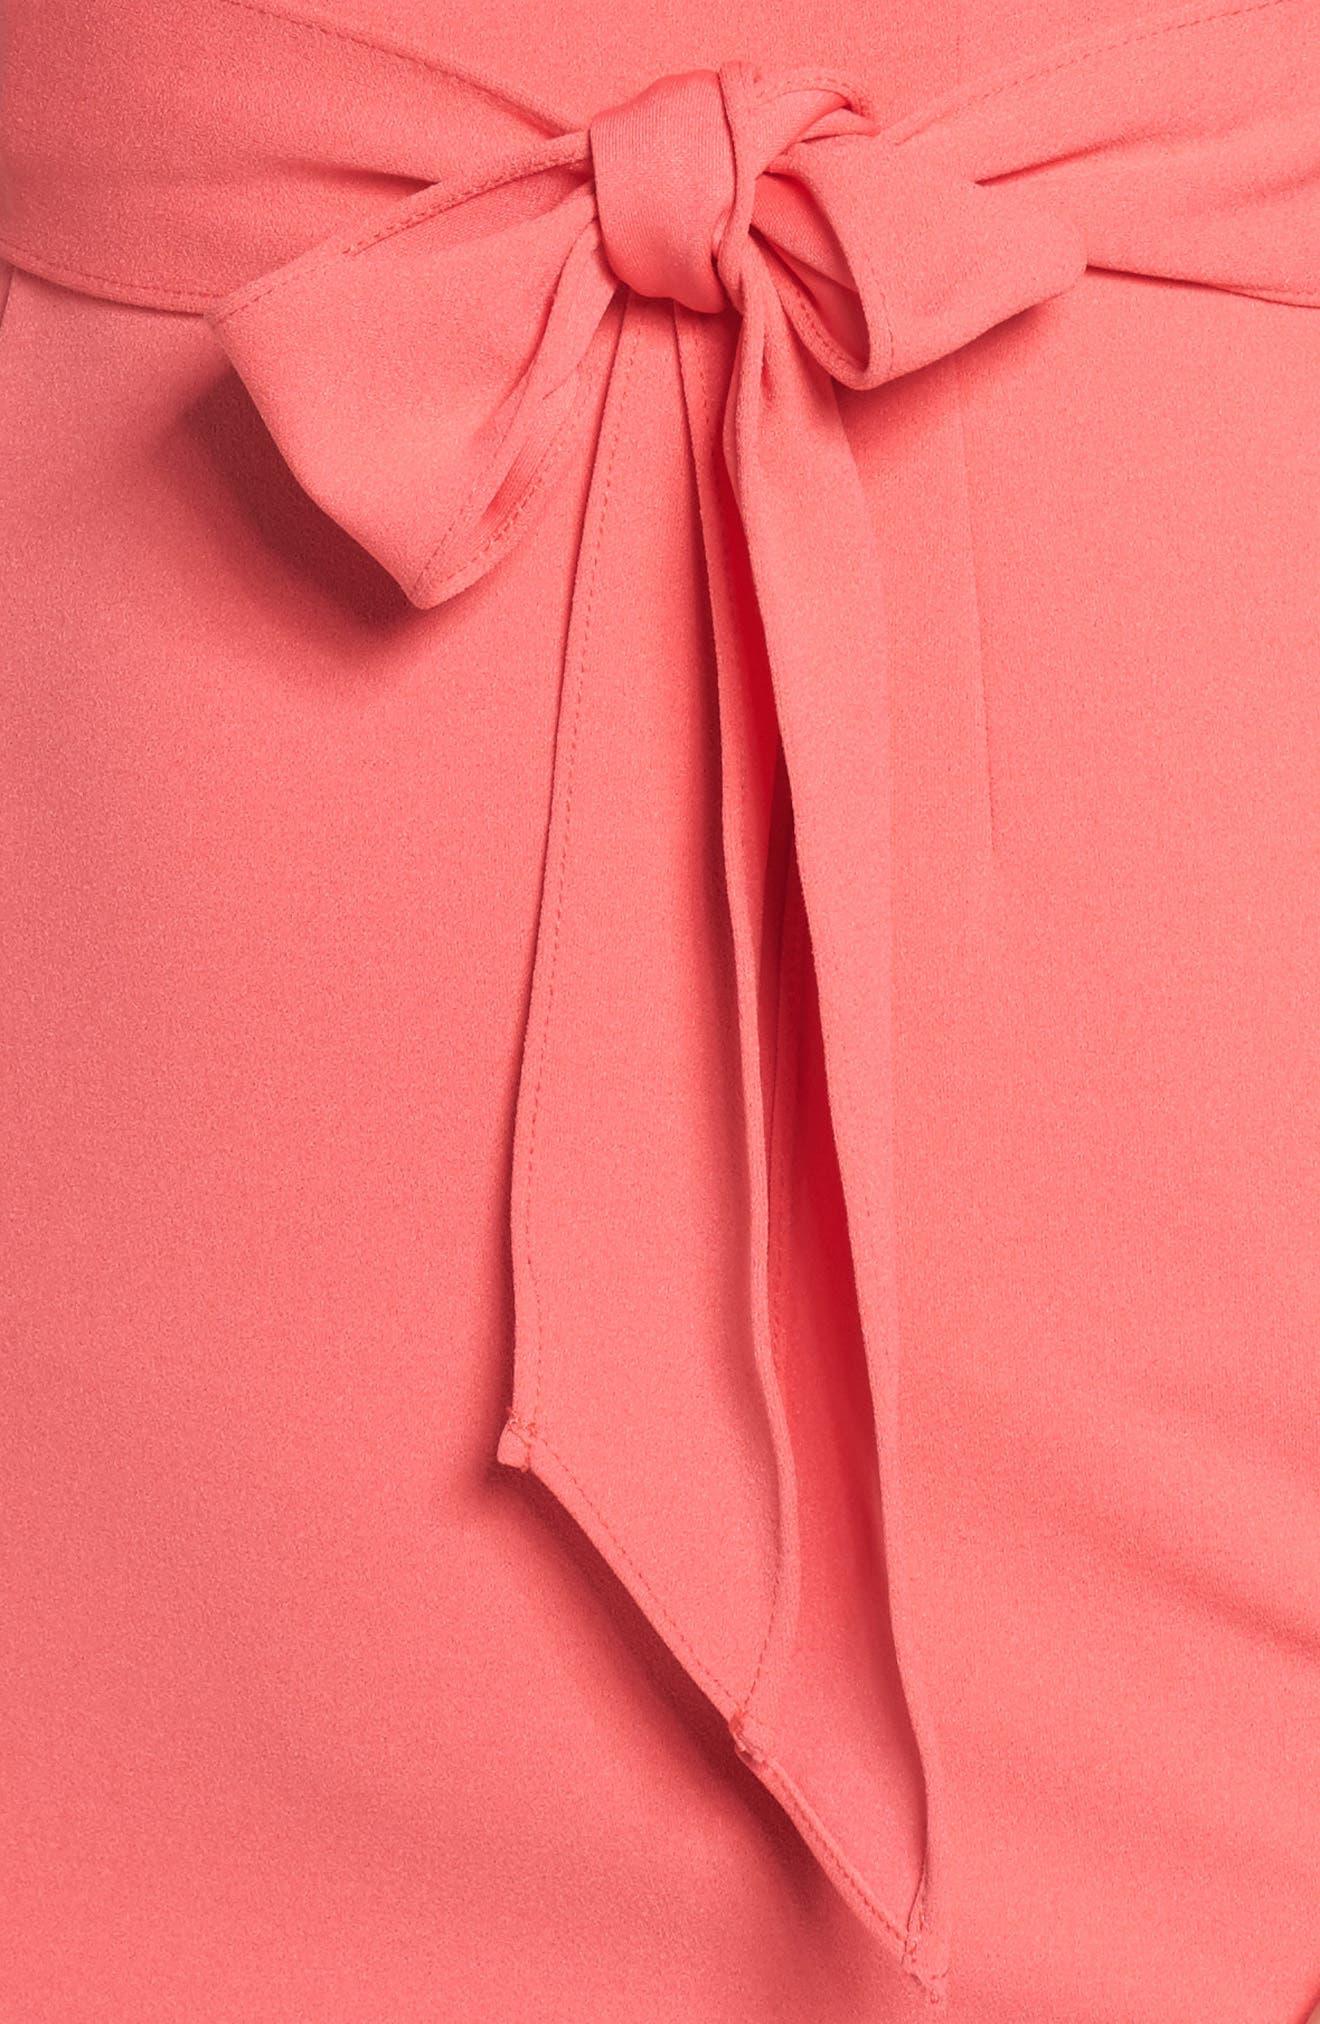 Roll Neck Crepe Dress,                             Alternate thumbnail 4, color,                             650